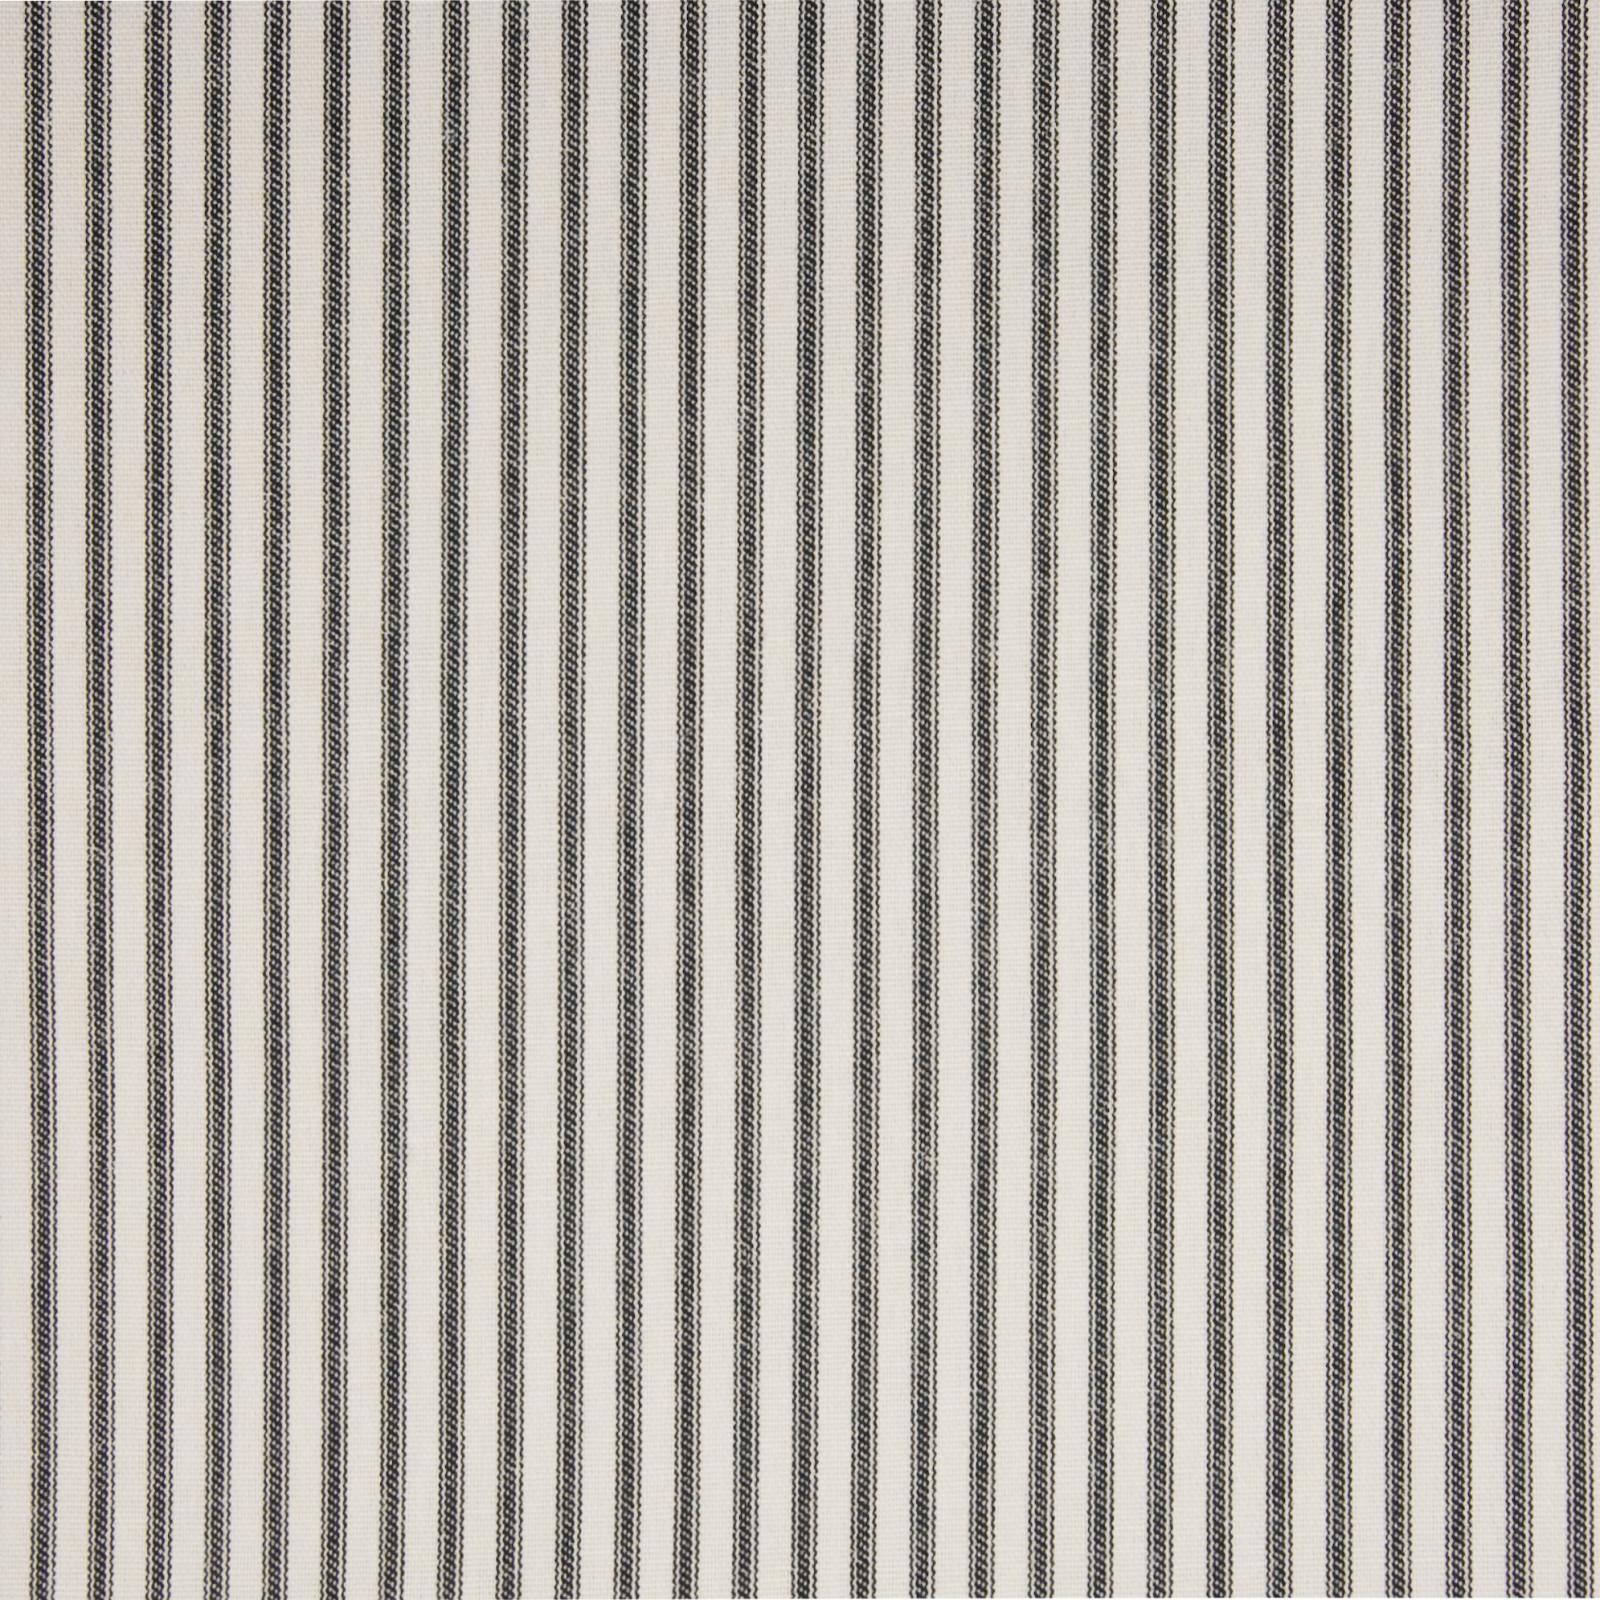 A9913 Black Greenhouse Fabrics